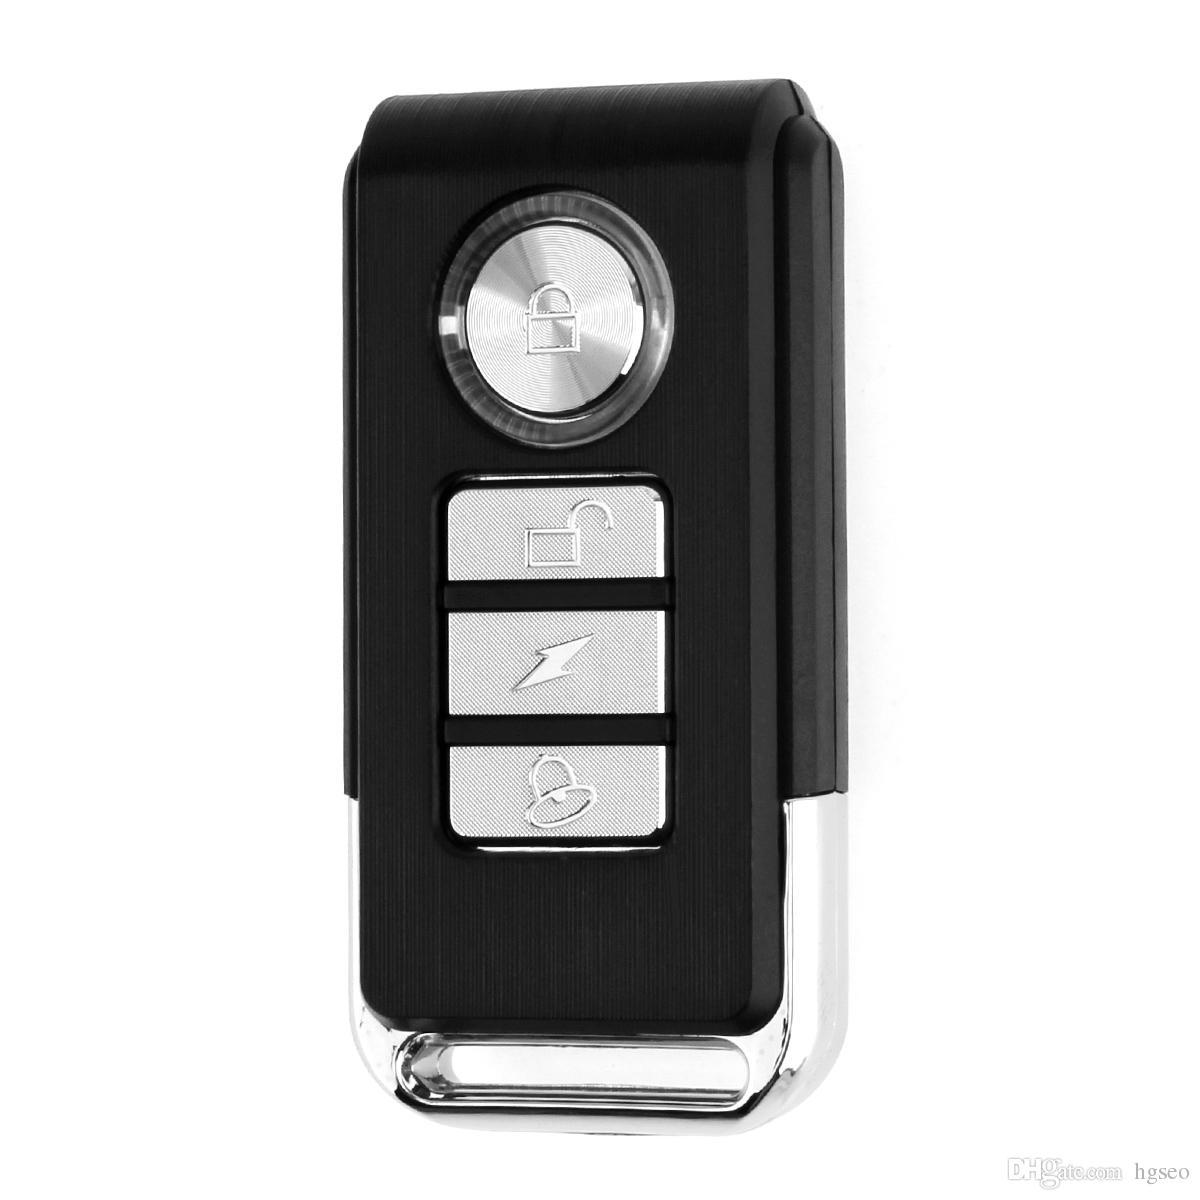 Home Security Tür Fenster Sirene Magnetic Sensor Alarm Warnsystem Wireless Fernbedienung Tür Detektor Alarmanlage SAM_402